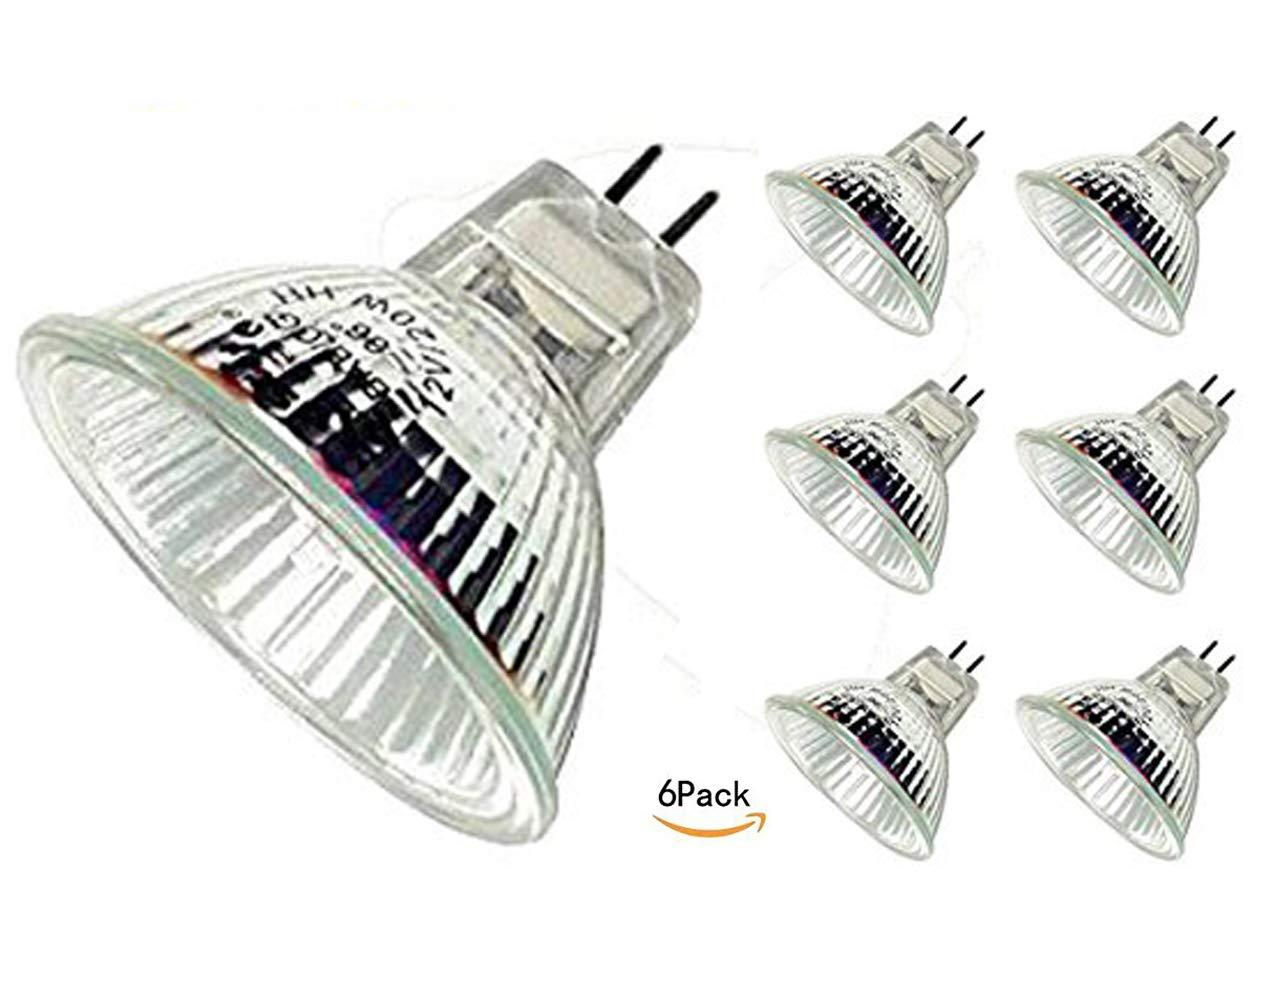 CTKcom Halogen Light Bulbs(6 pack) - 12Volt 20Watt MR16 Halogen Lamp, Bi Pin Wide Beam High Lumens 2000Hr Life, Precision Halogen Reflector Fiber Optic Light Bulb 12V 20W, 6 pack